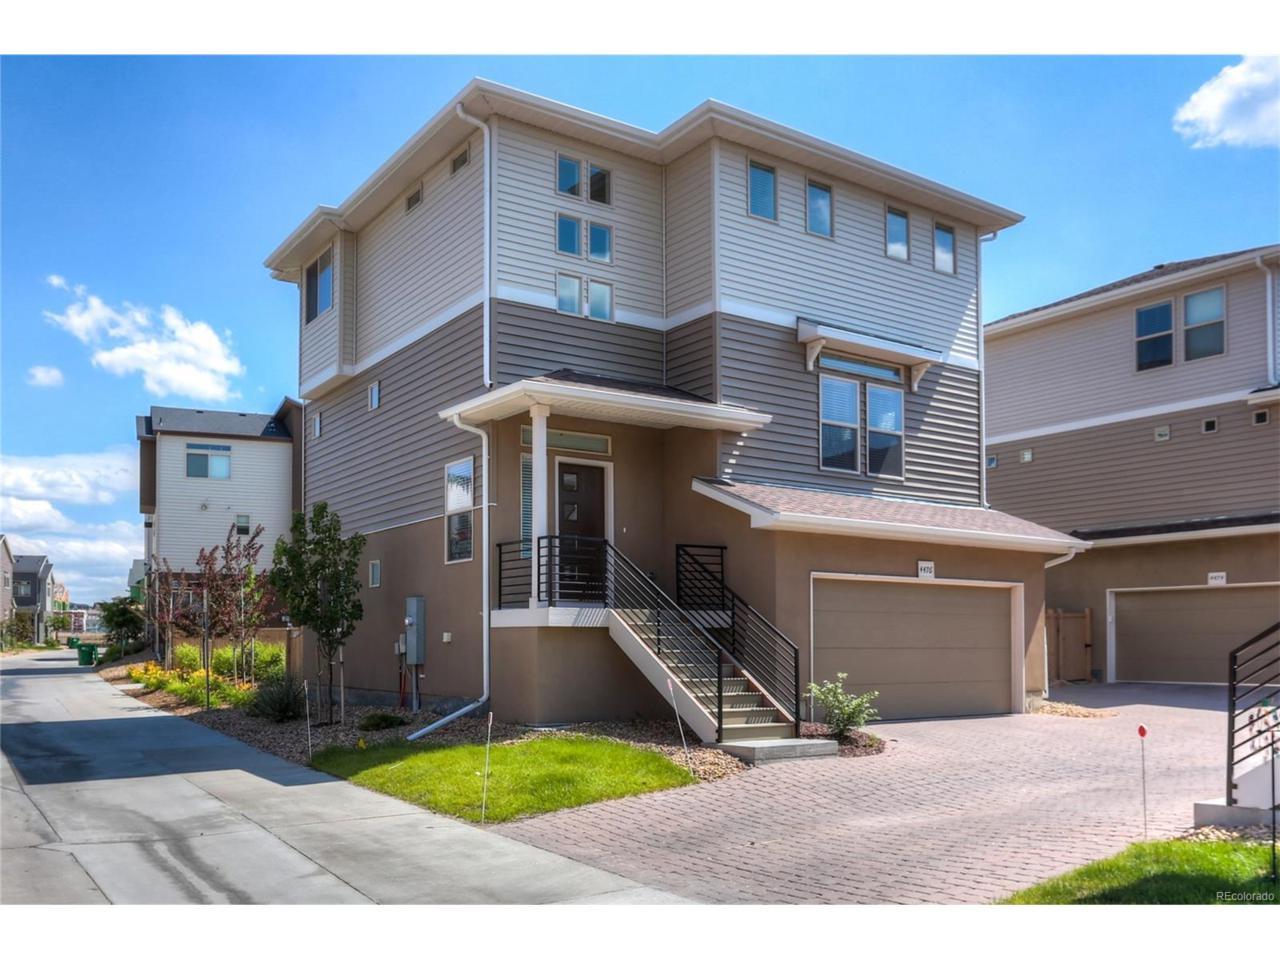 4476 Vindaloo Drive, Castle Rock, CO 80109 (MLS #2704392) :: 8z Real Estate